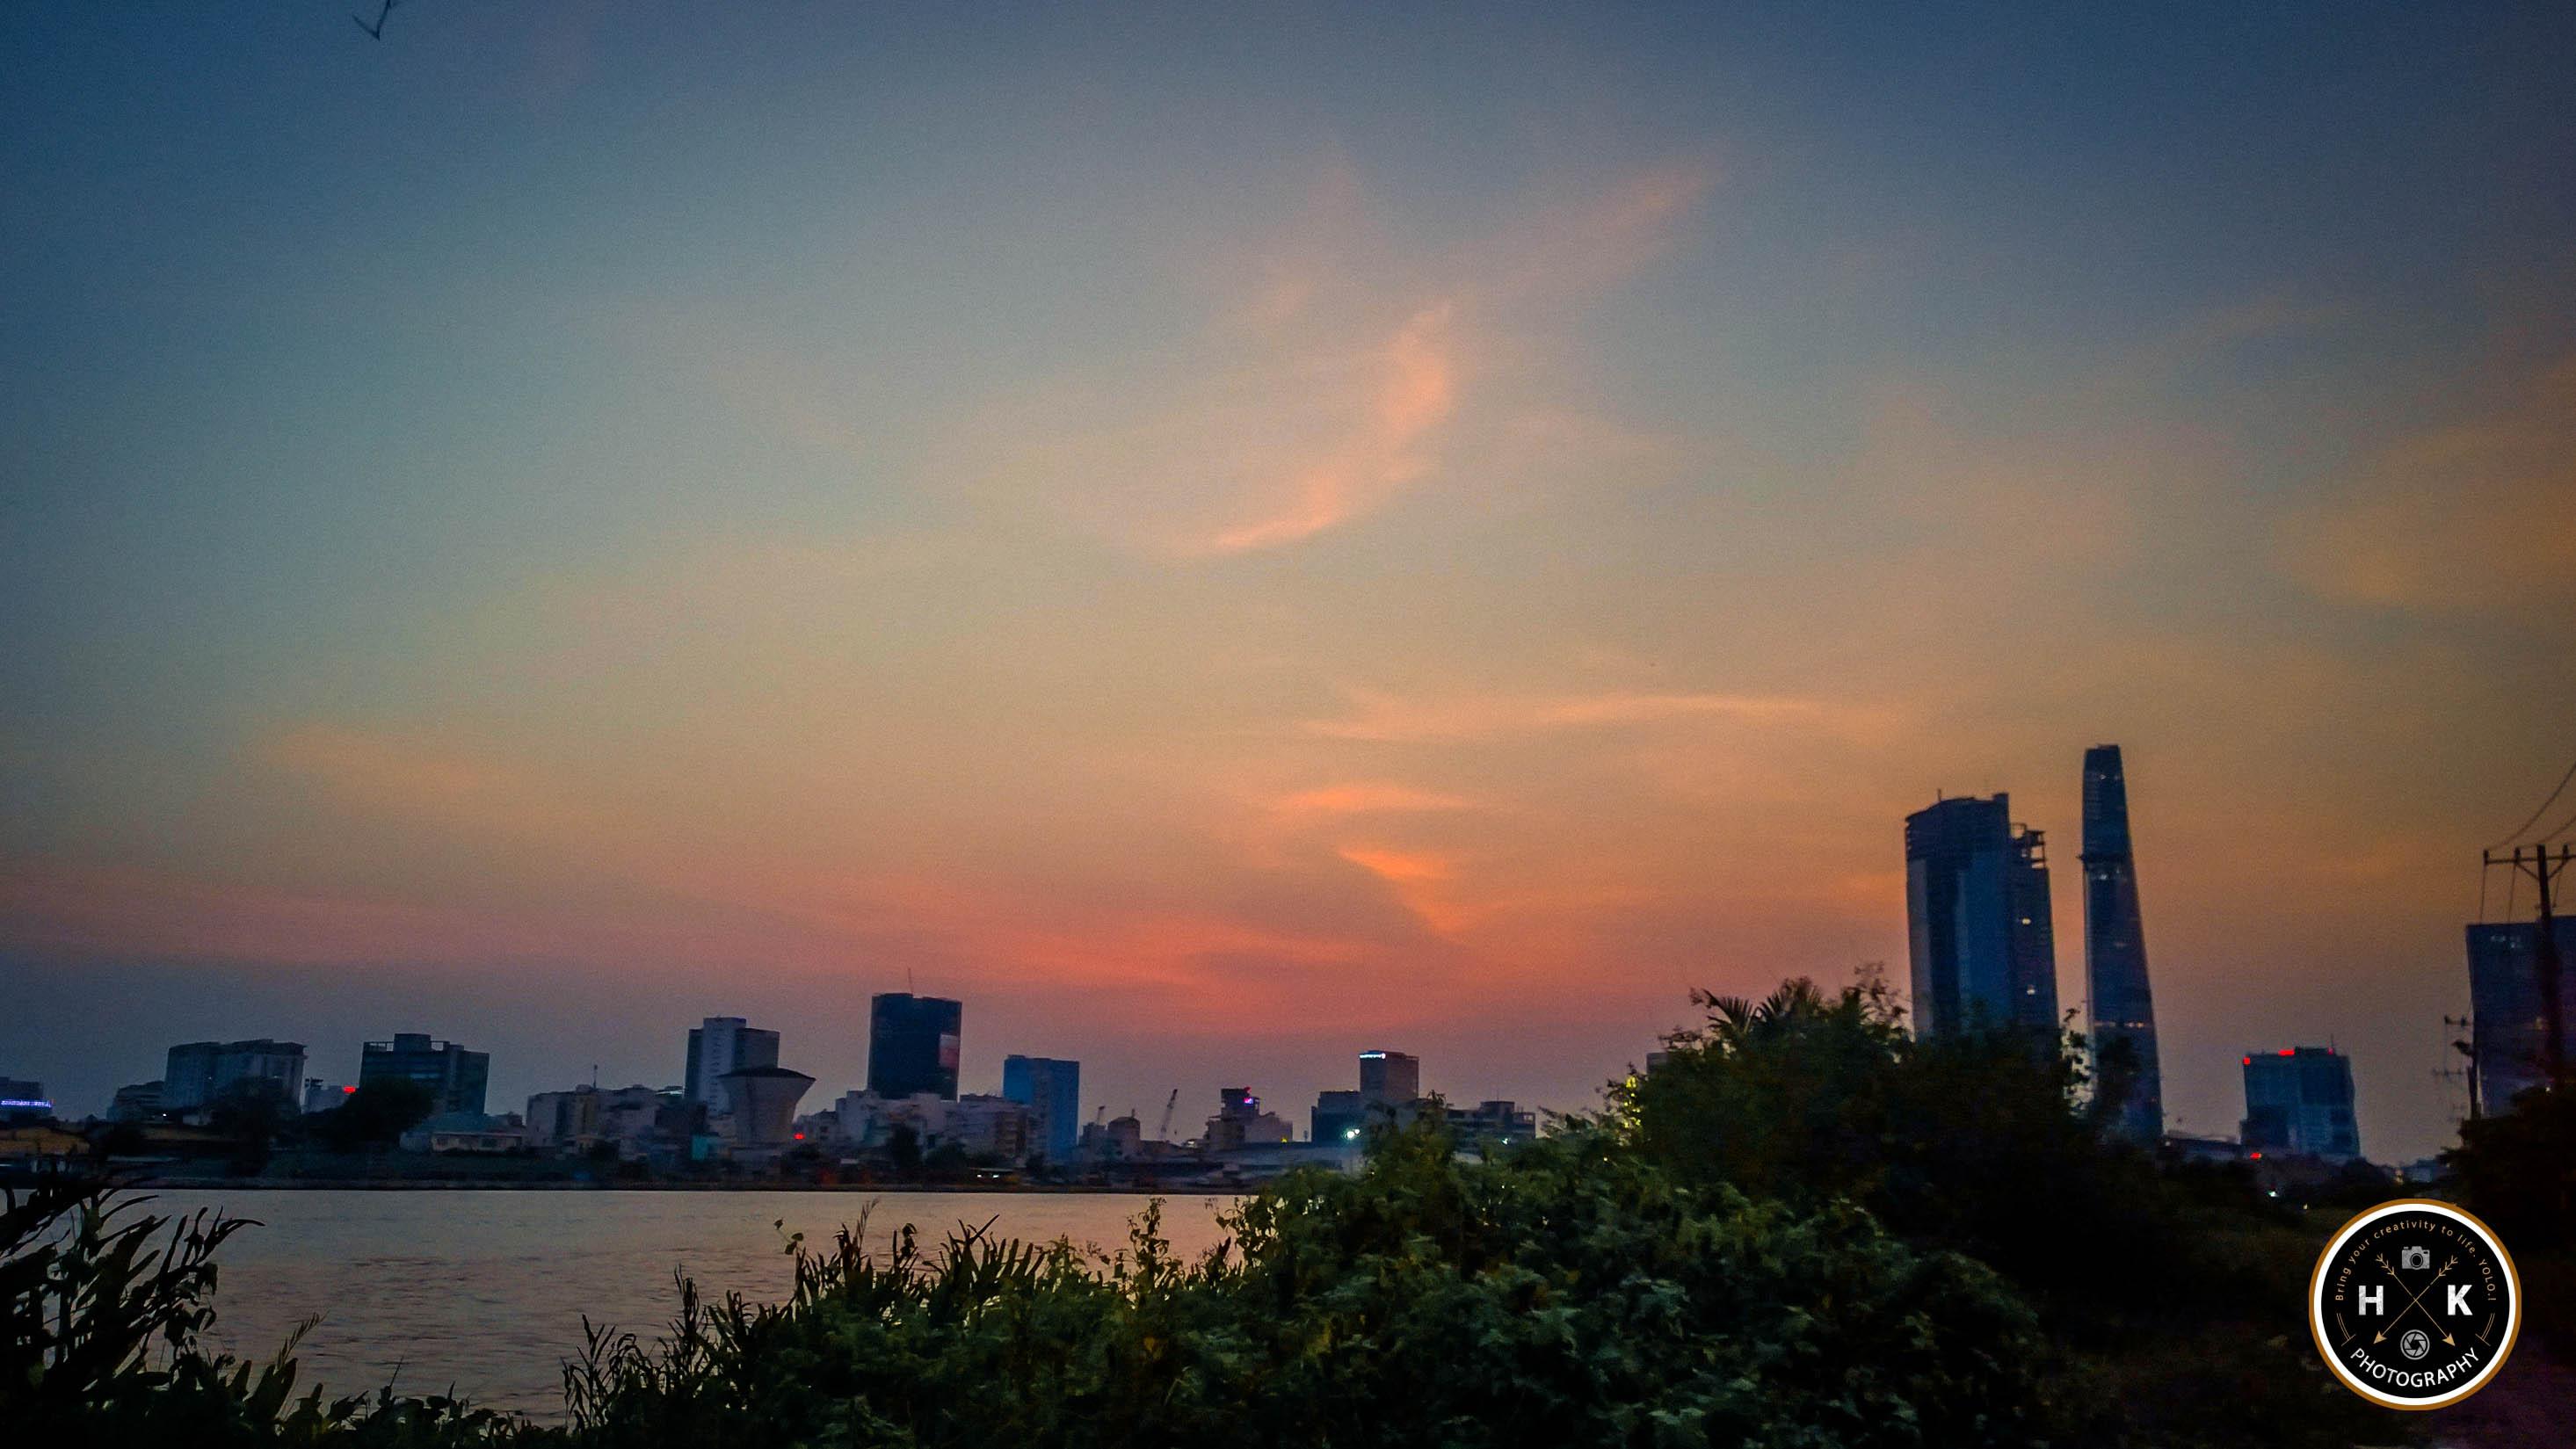 sunset-4_17060285889_o.jpg